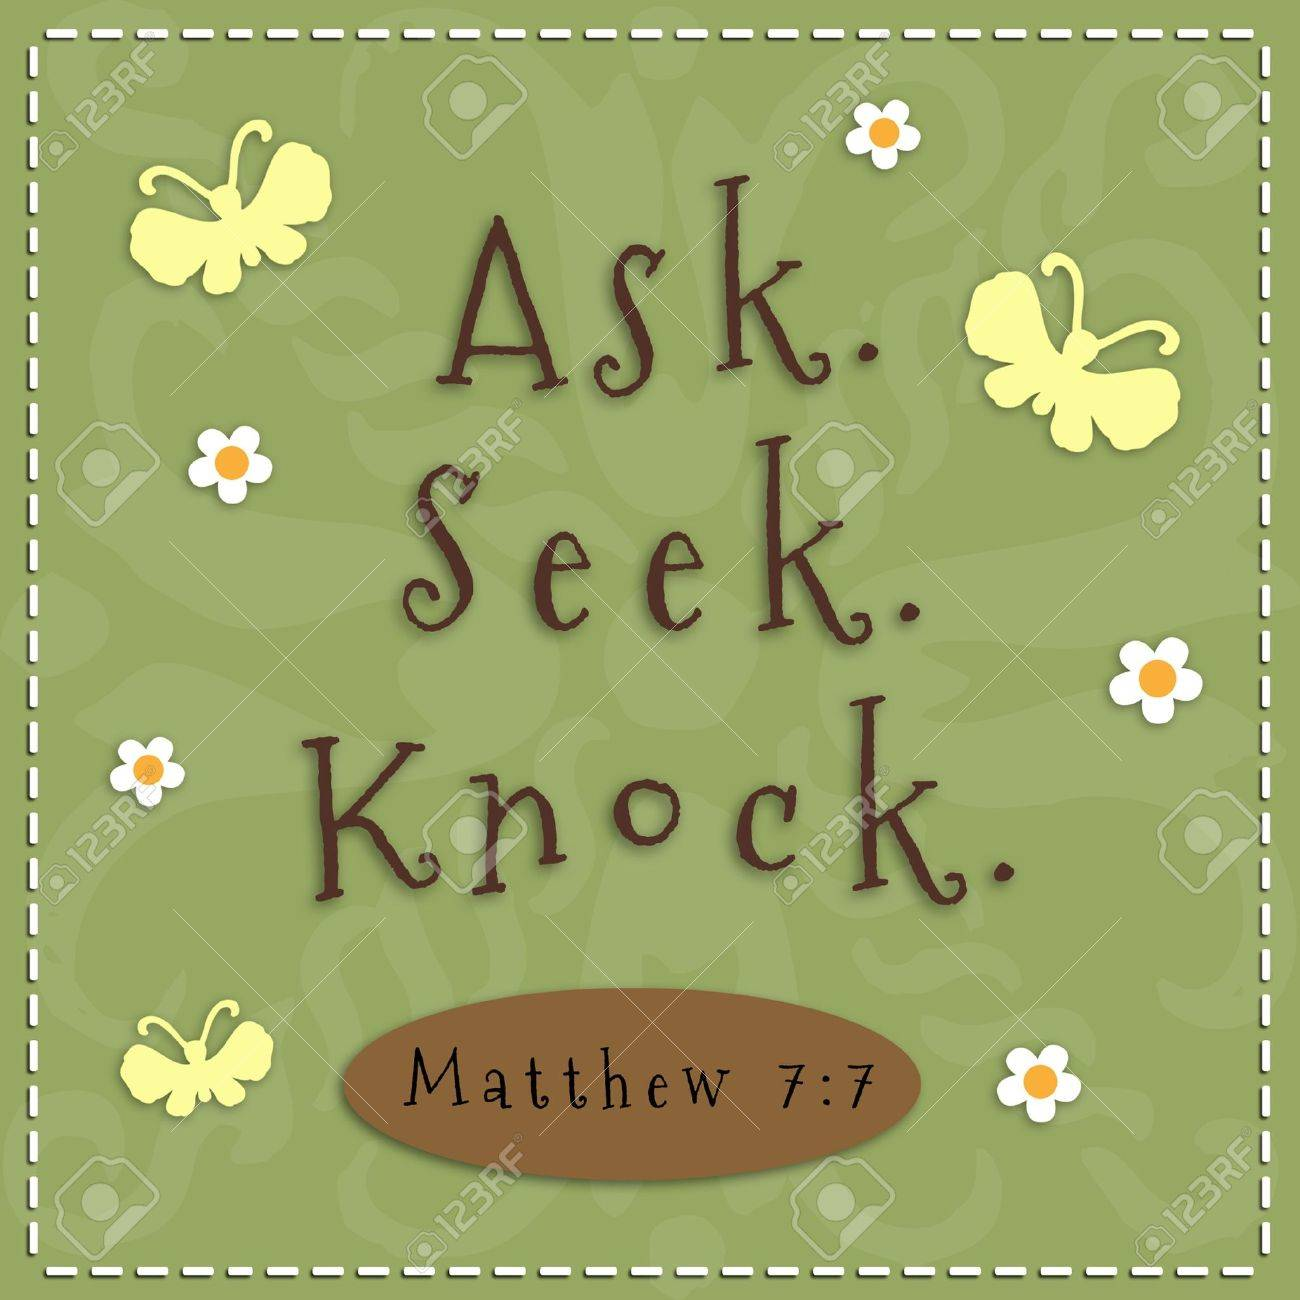 Ask, Seek, Knock sign from Matthew 7 7 - 19706051